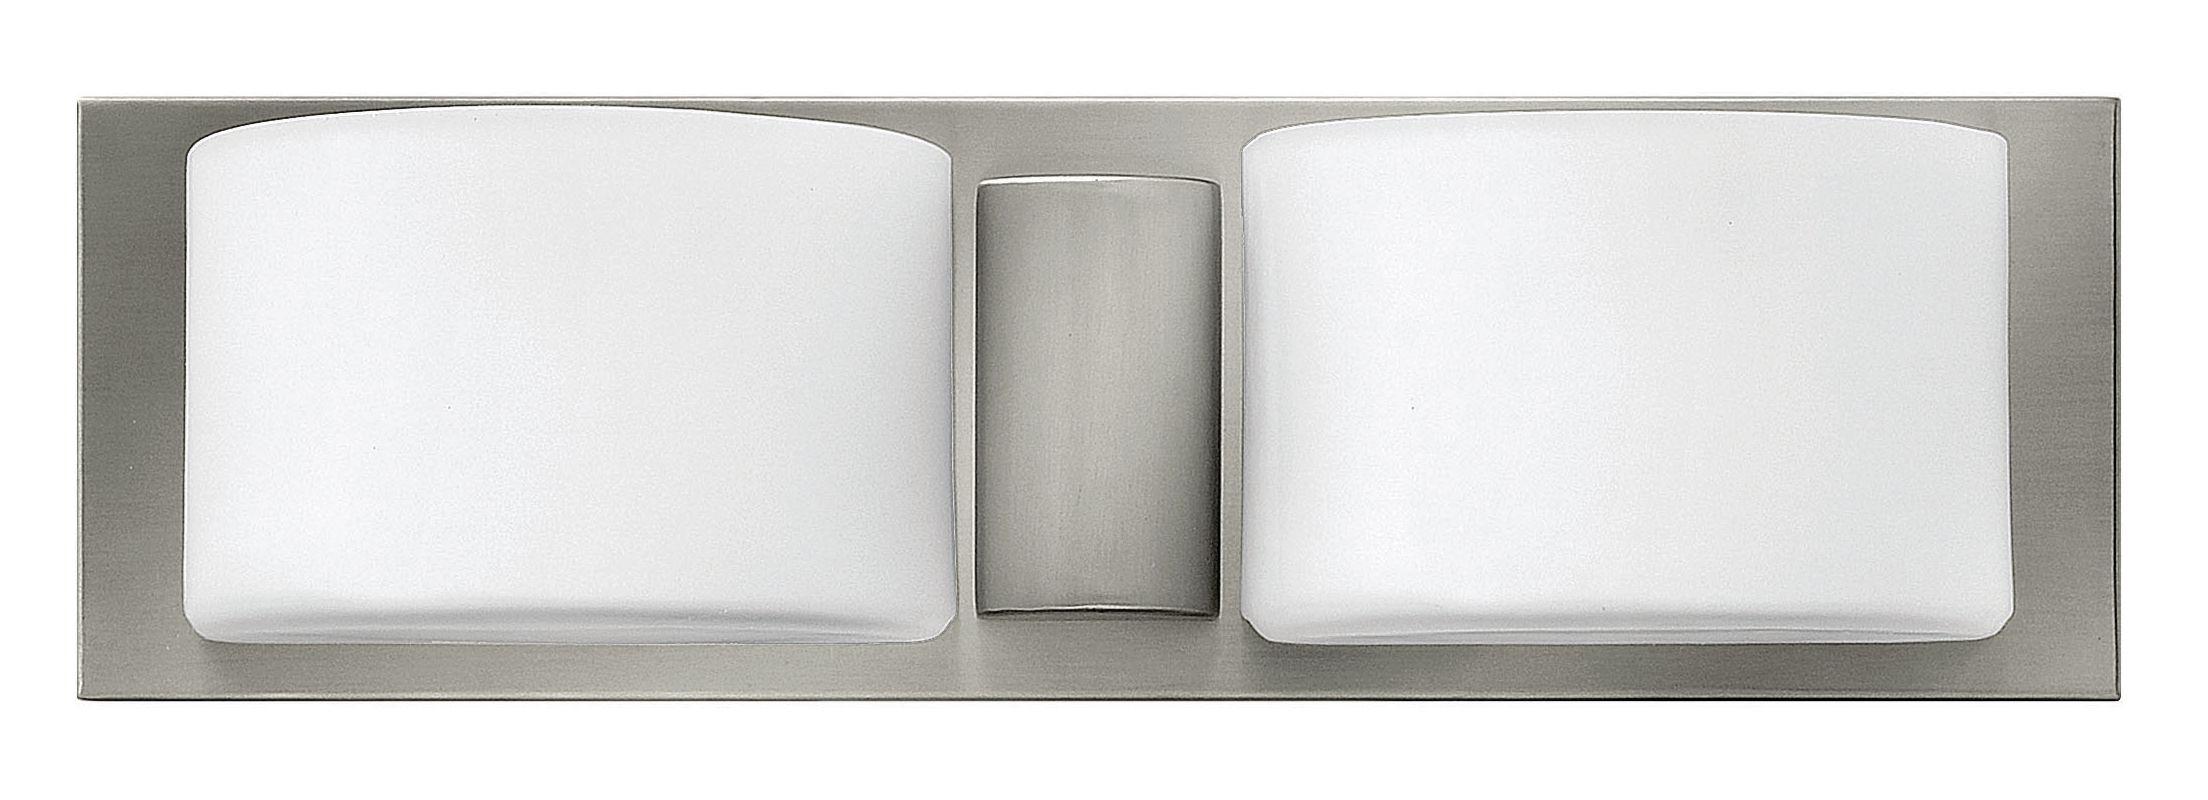 Hinkley Lighting 55482-LED 2 Light LED Bathroom Vanity Light from the Sale $339.00 ITEM: bci2635540 ID#:55482BN-LED UPC: 640665554892 :